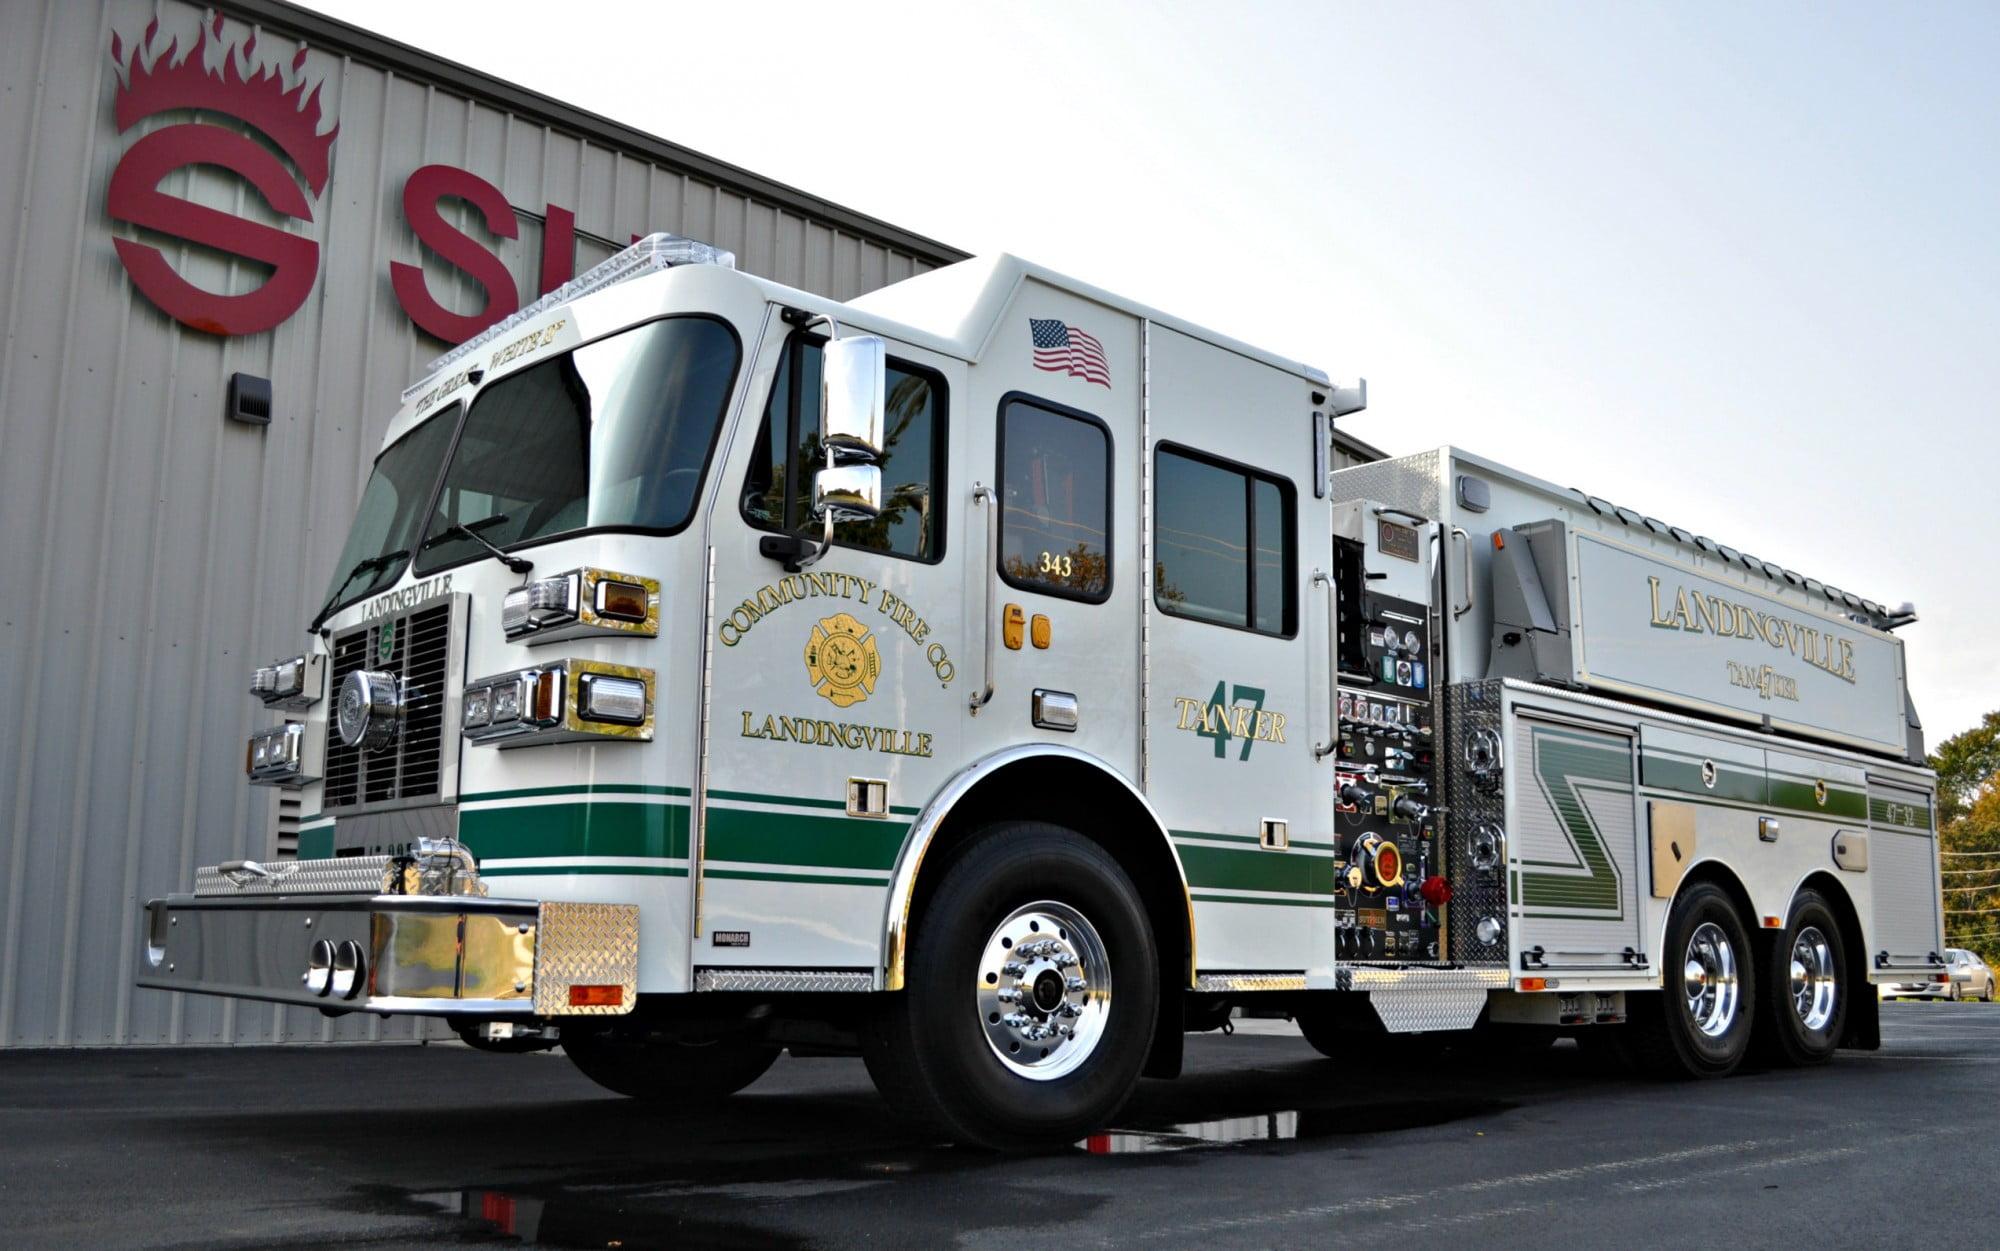 Community Fire Company